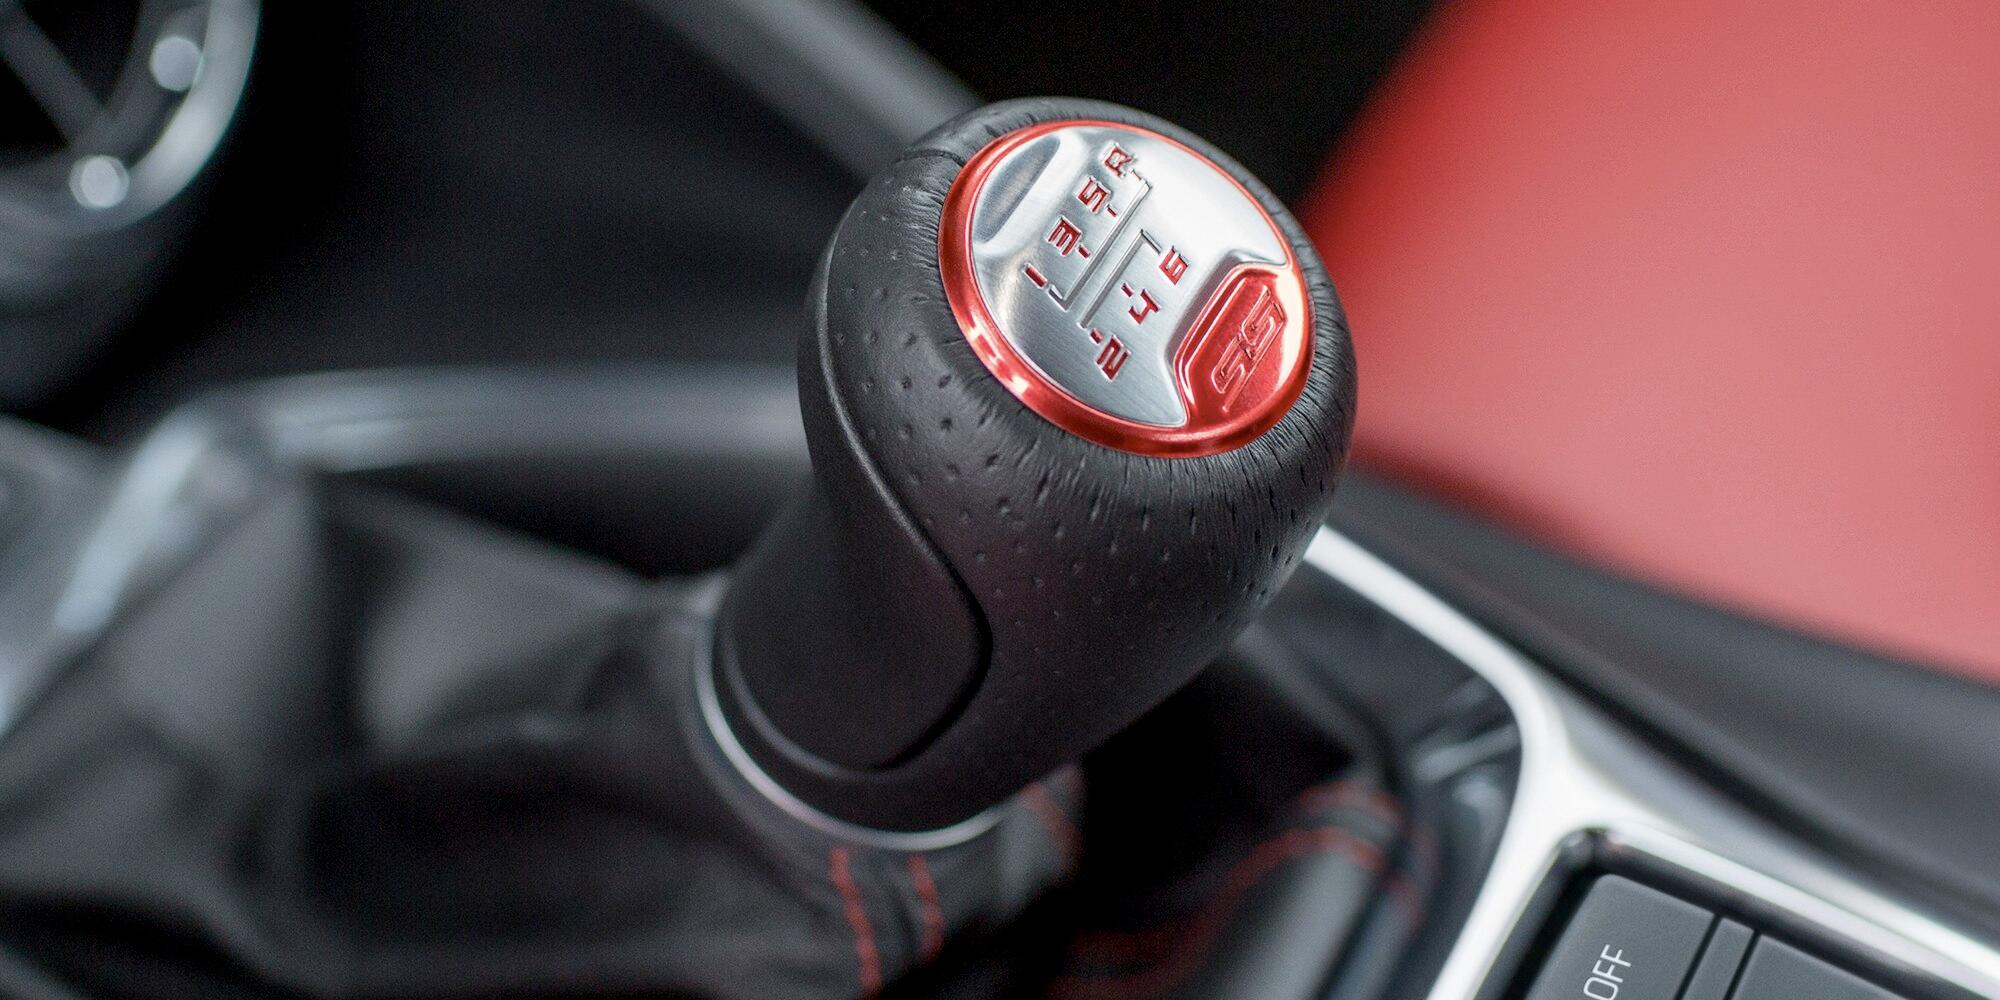 2019 Chevrolet Camaro Performance